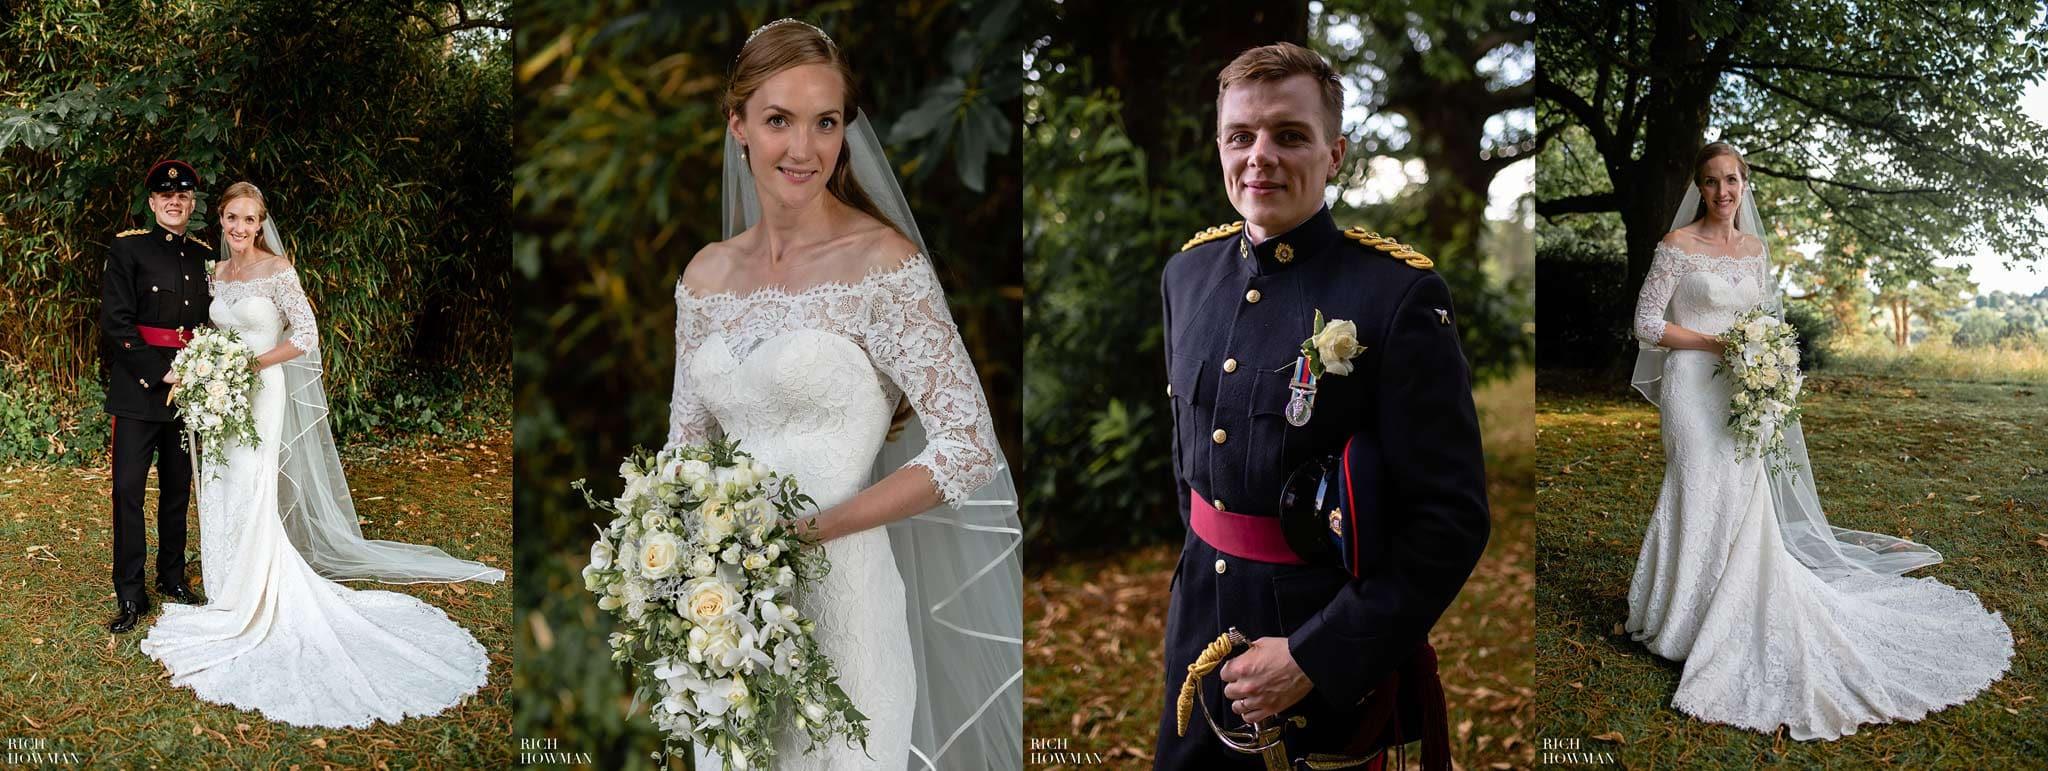 Military Wedding Photographers 516